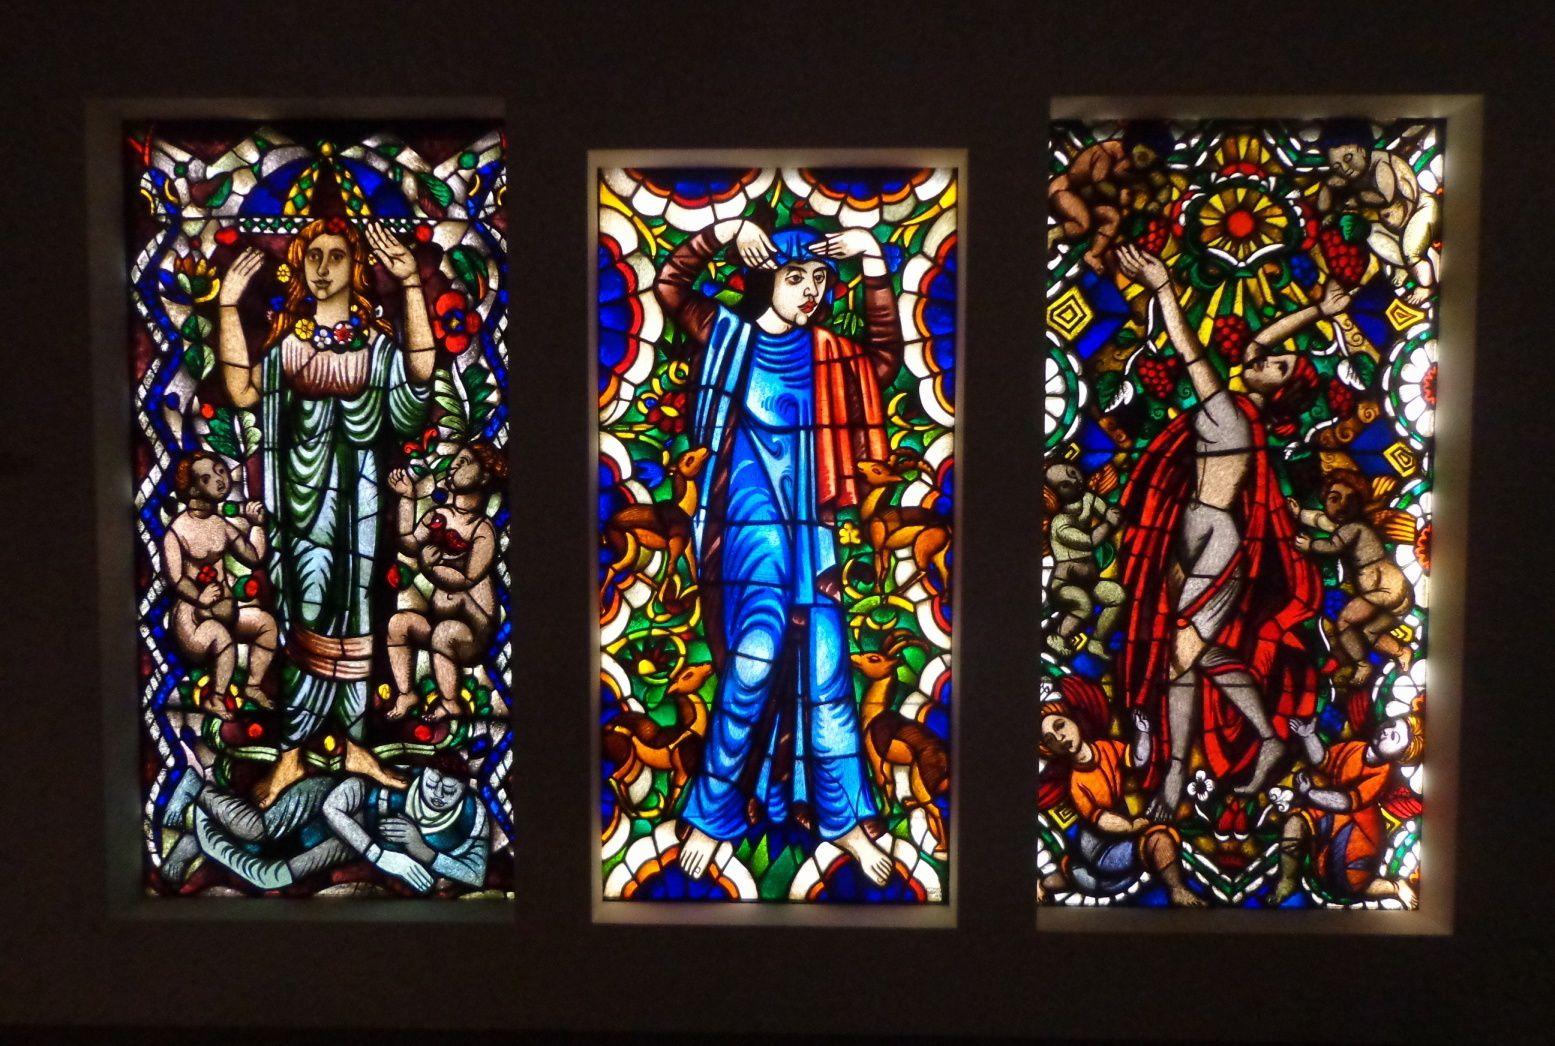 Panneaux en vitrail - Max Pechstein, 1911/13